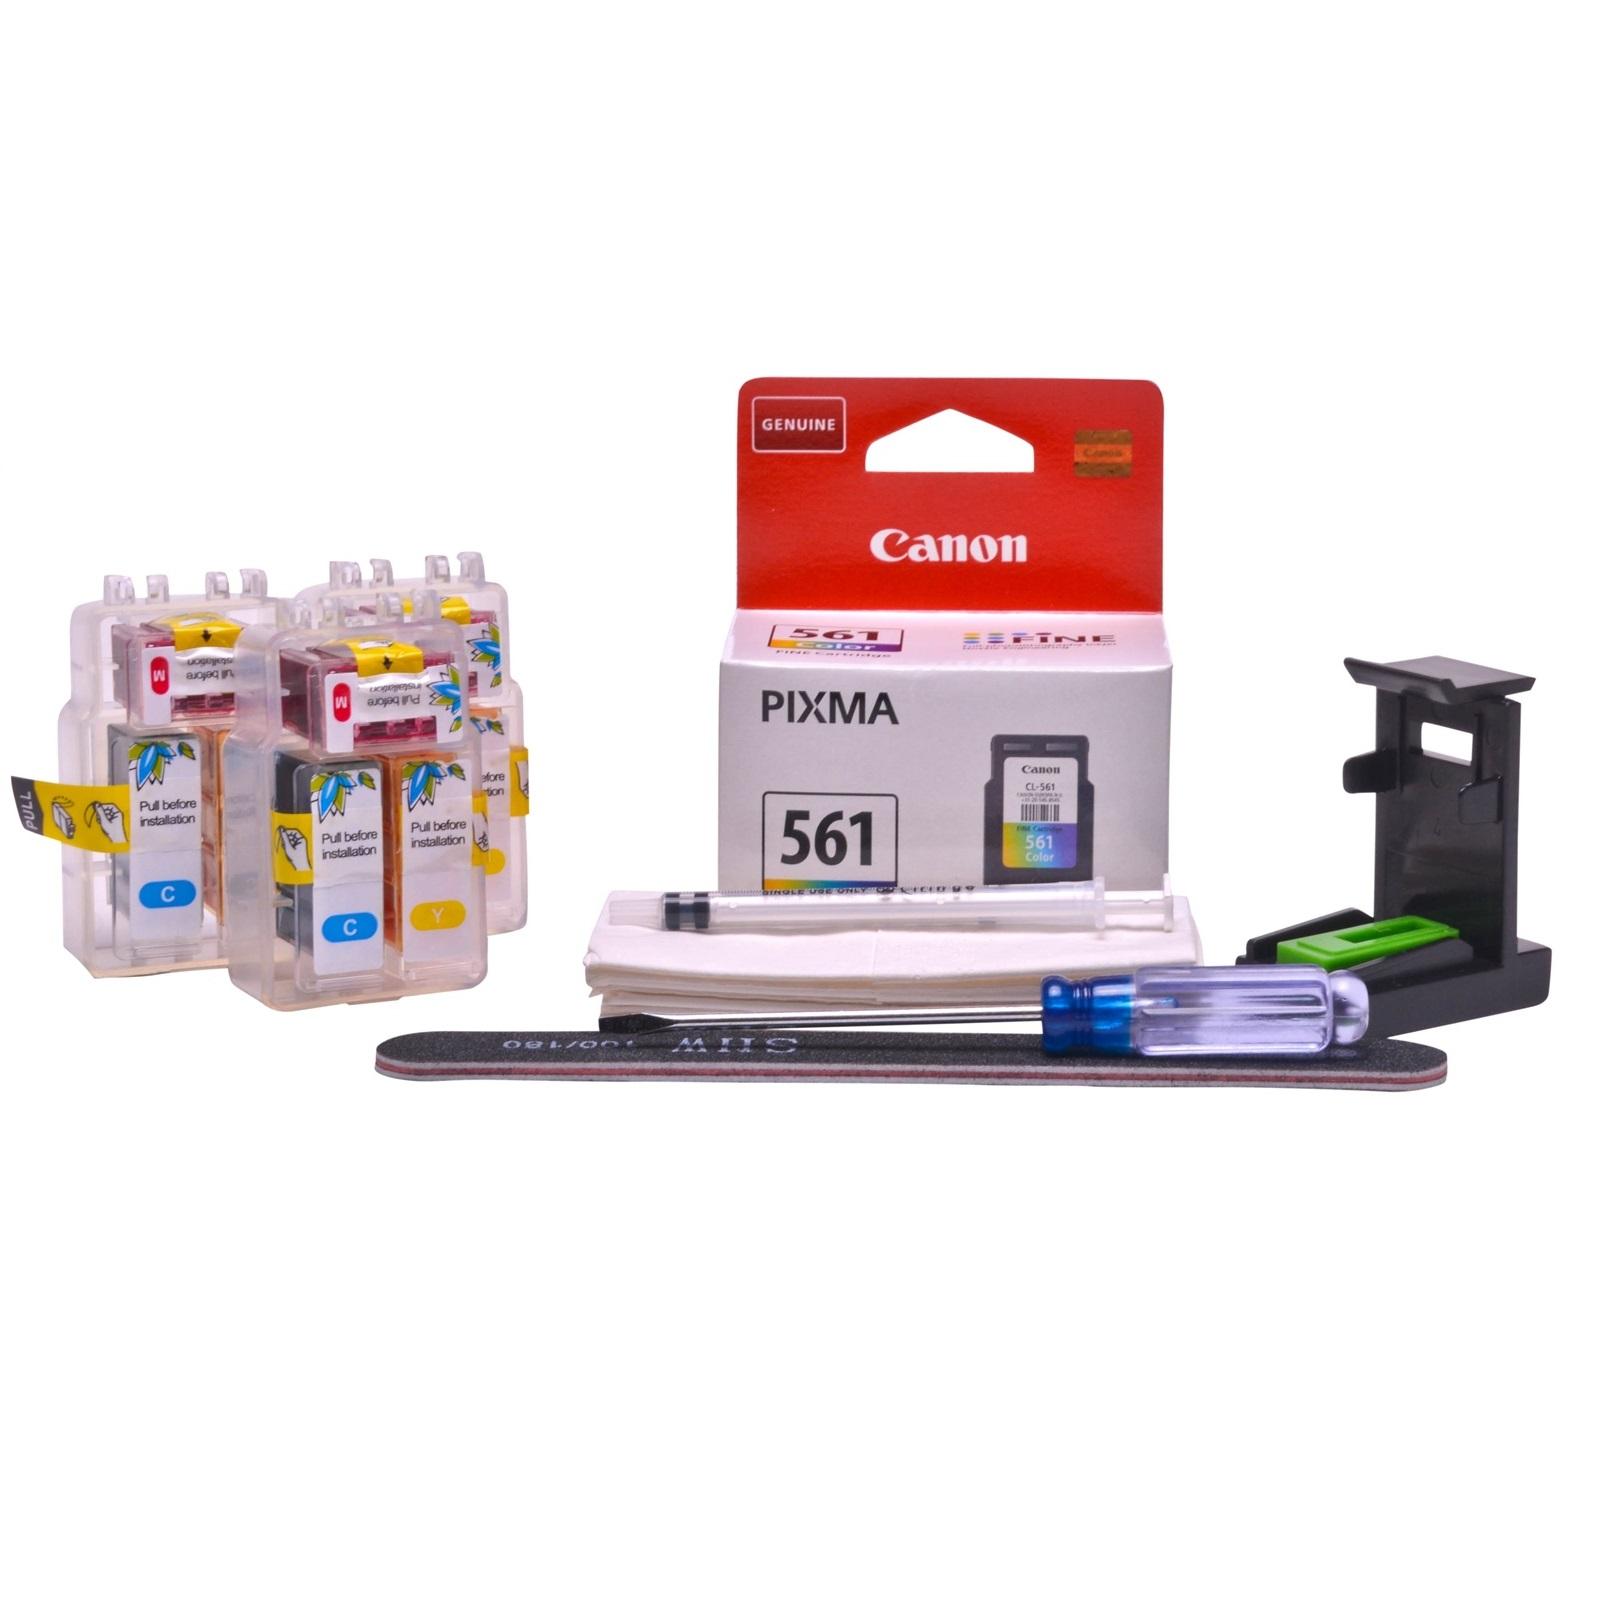 Refillable CL-561 Colour Pod Cheap printer cartridges for Canon Pixma TS5350 CL-561 dye ink